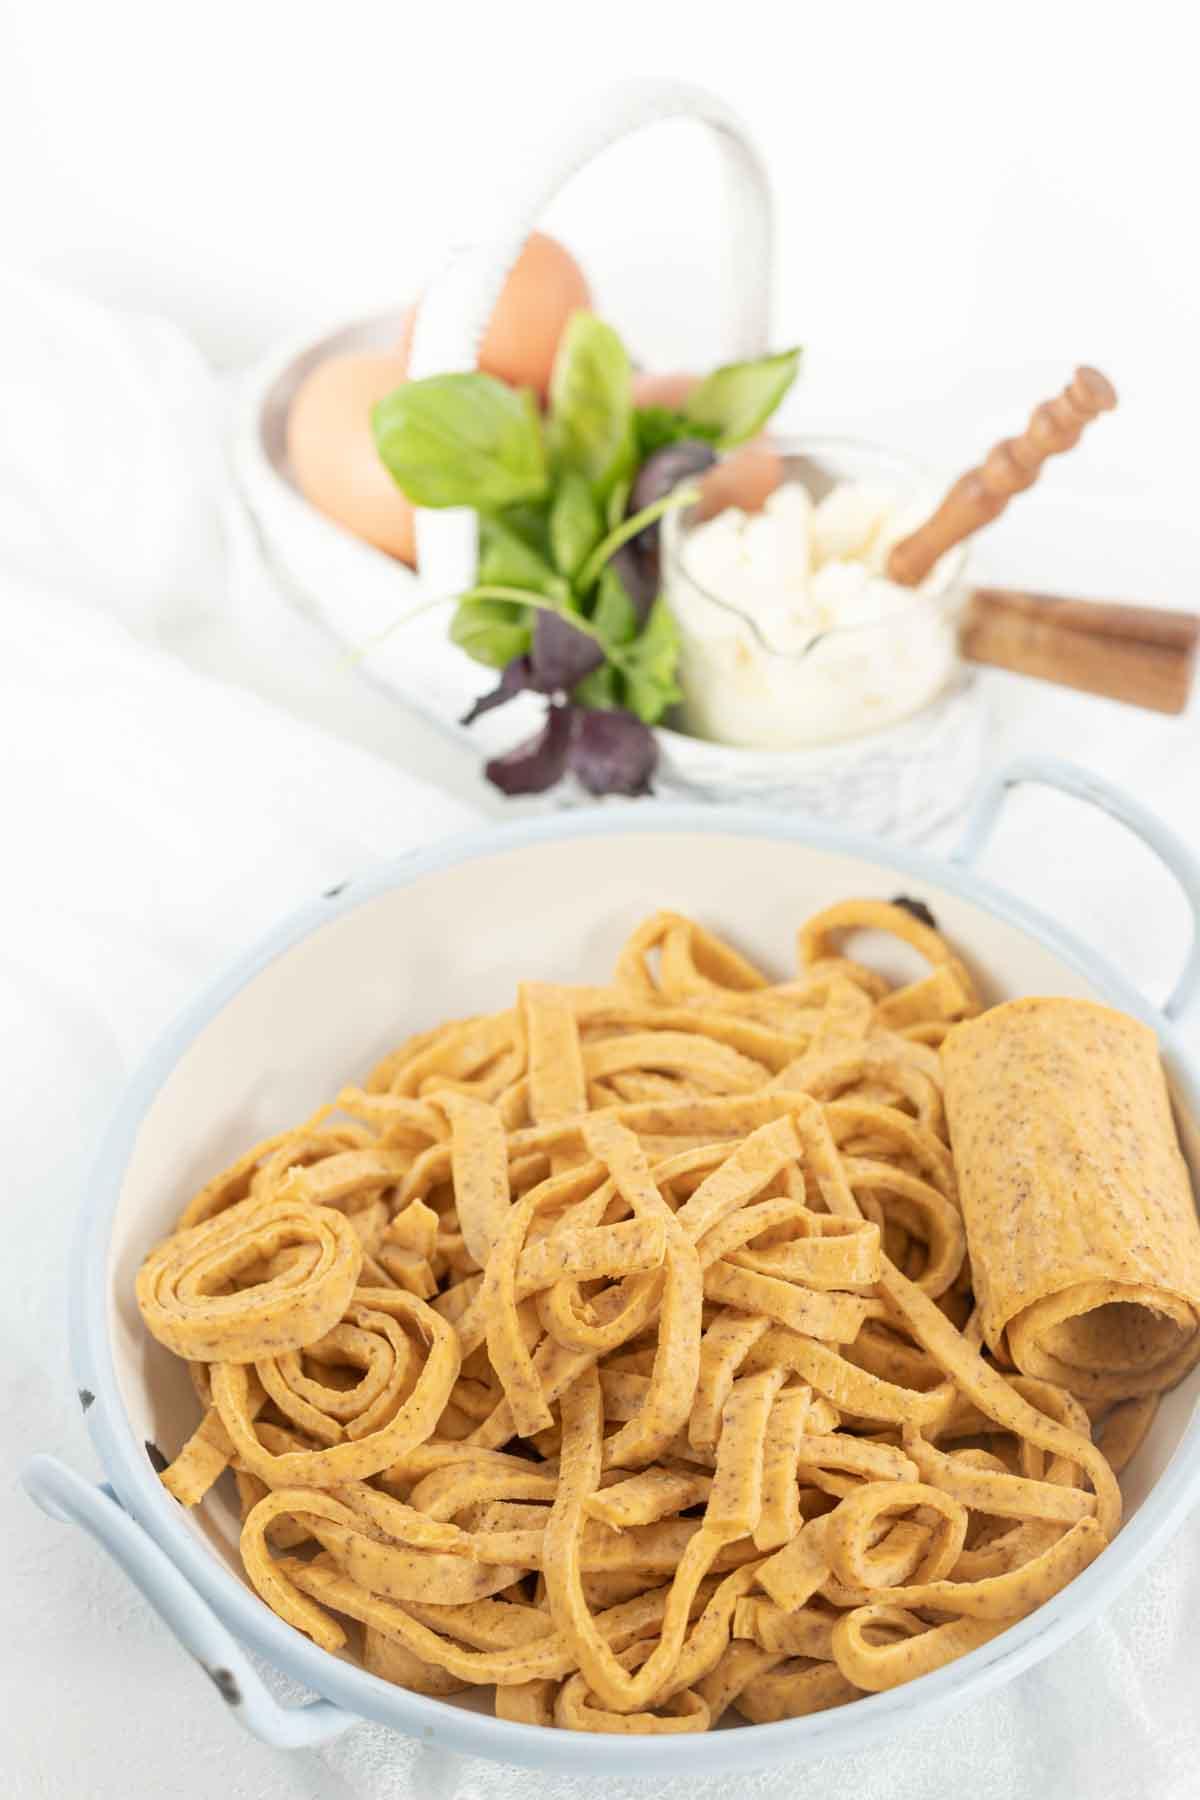 Low Carb Pasta Noodles in a bowl